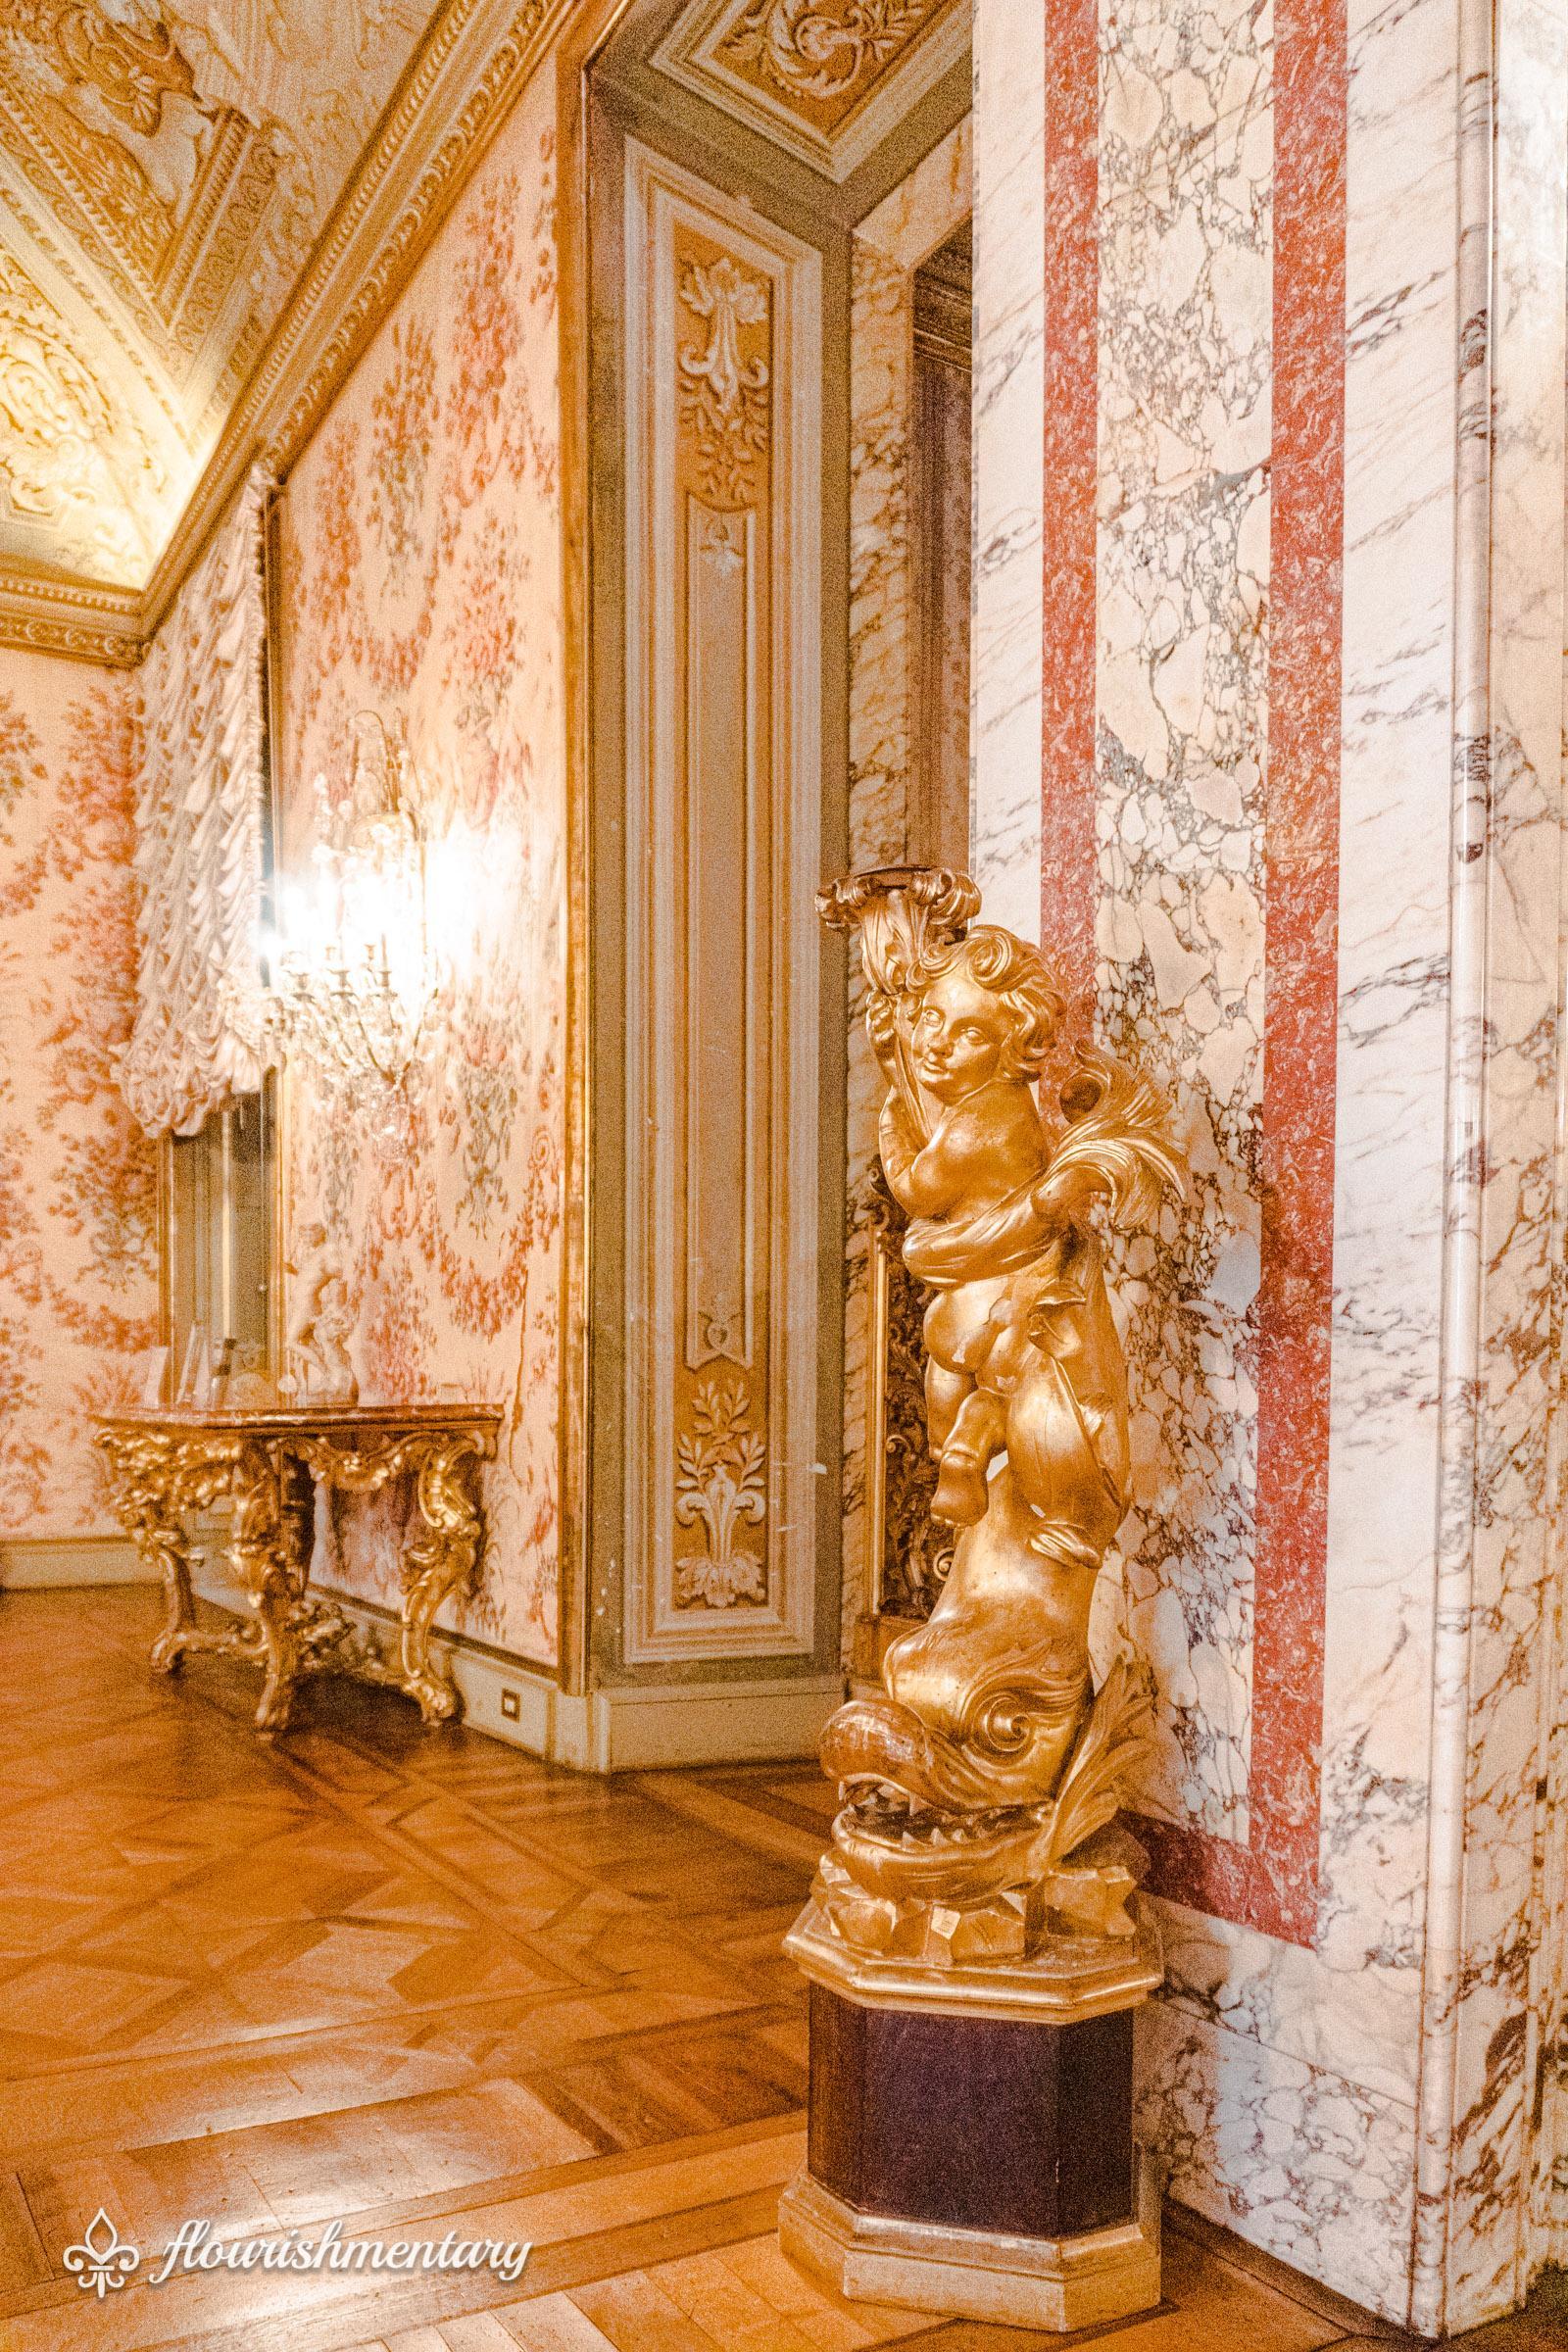 Galleria Doria Pamphilj ballroom